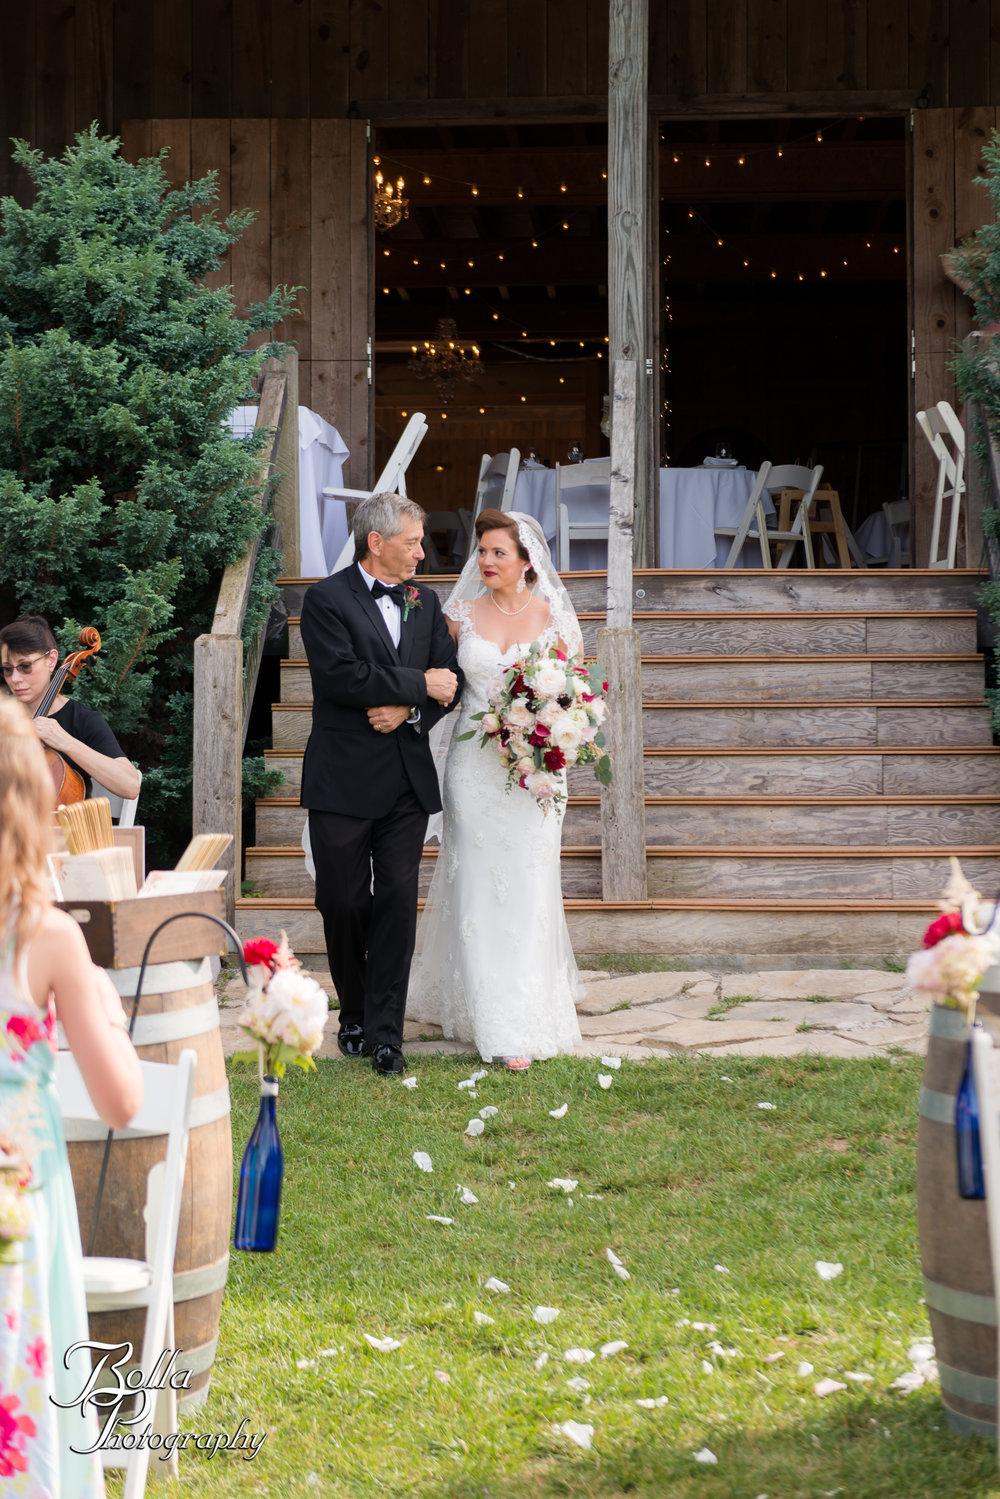 Bolla_photography_edwardsville_wedding_photographer_st_louis_weddings_Chaumette_winery_Mikusch-0342.jpg